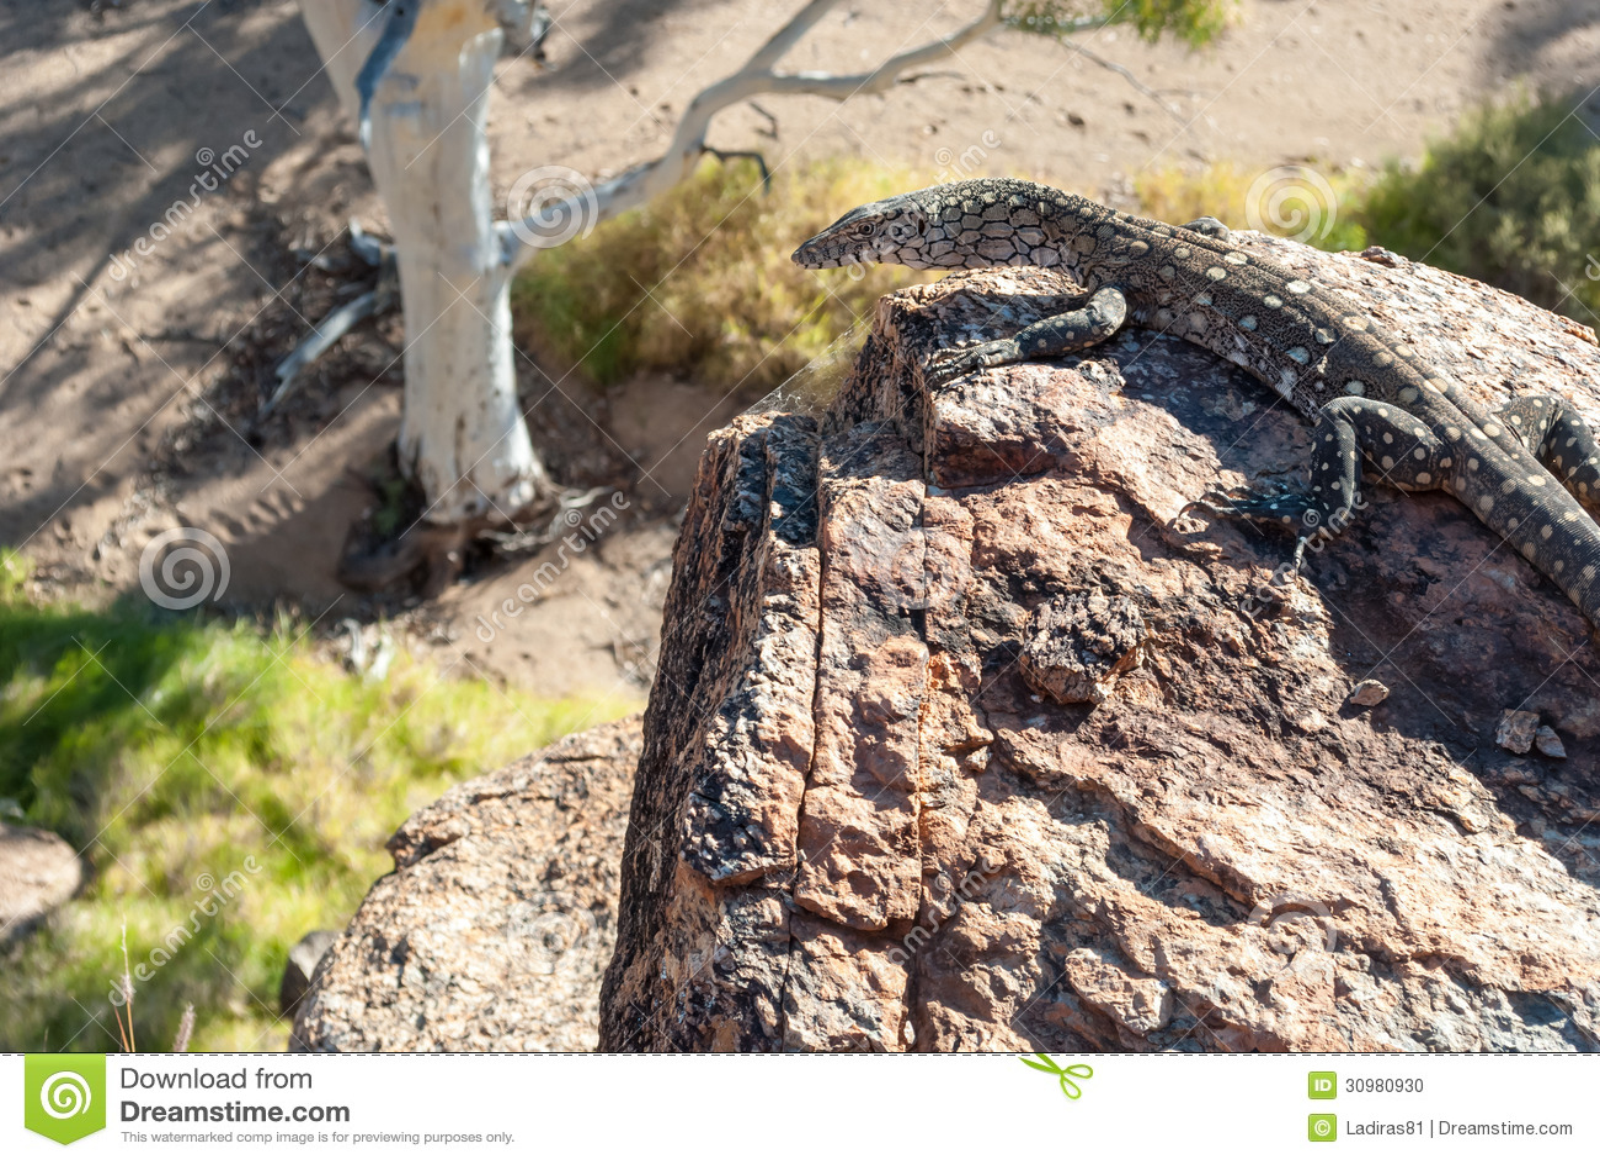 Wild Australian Lizard